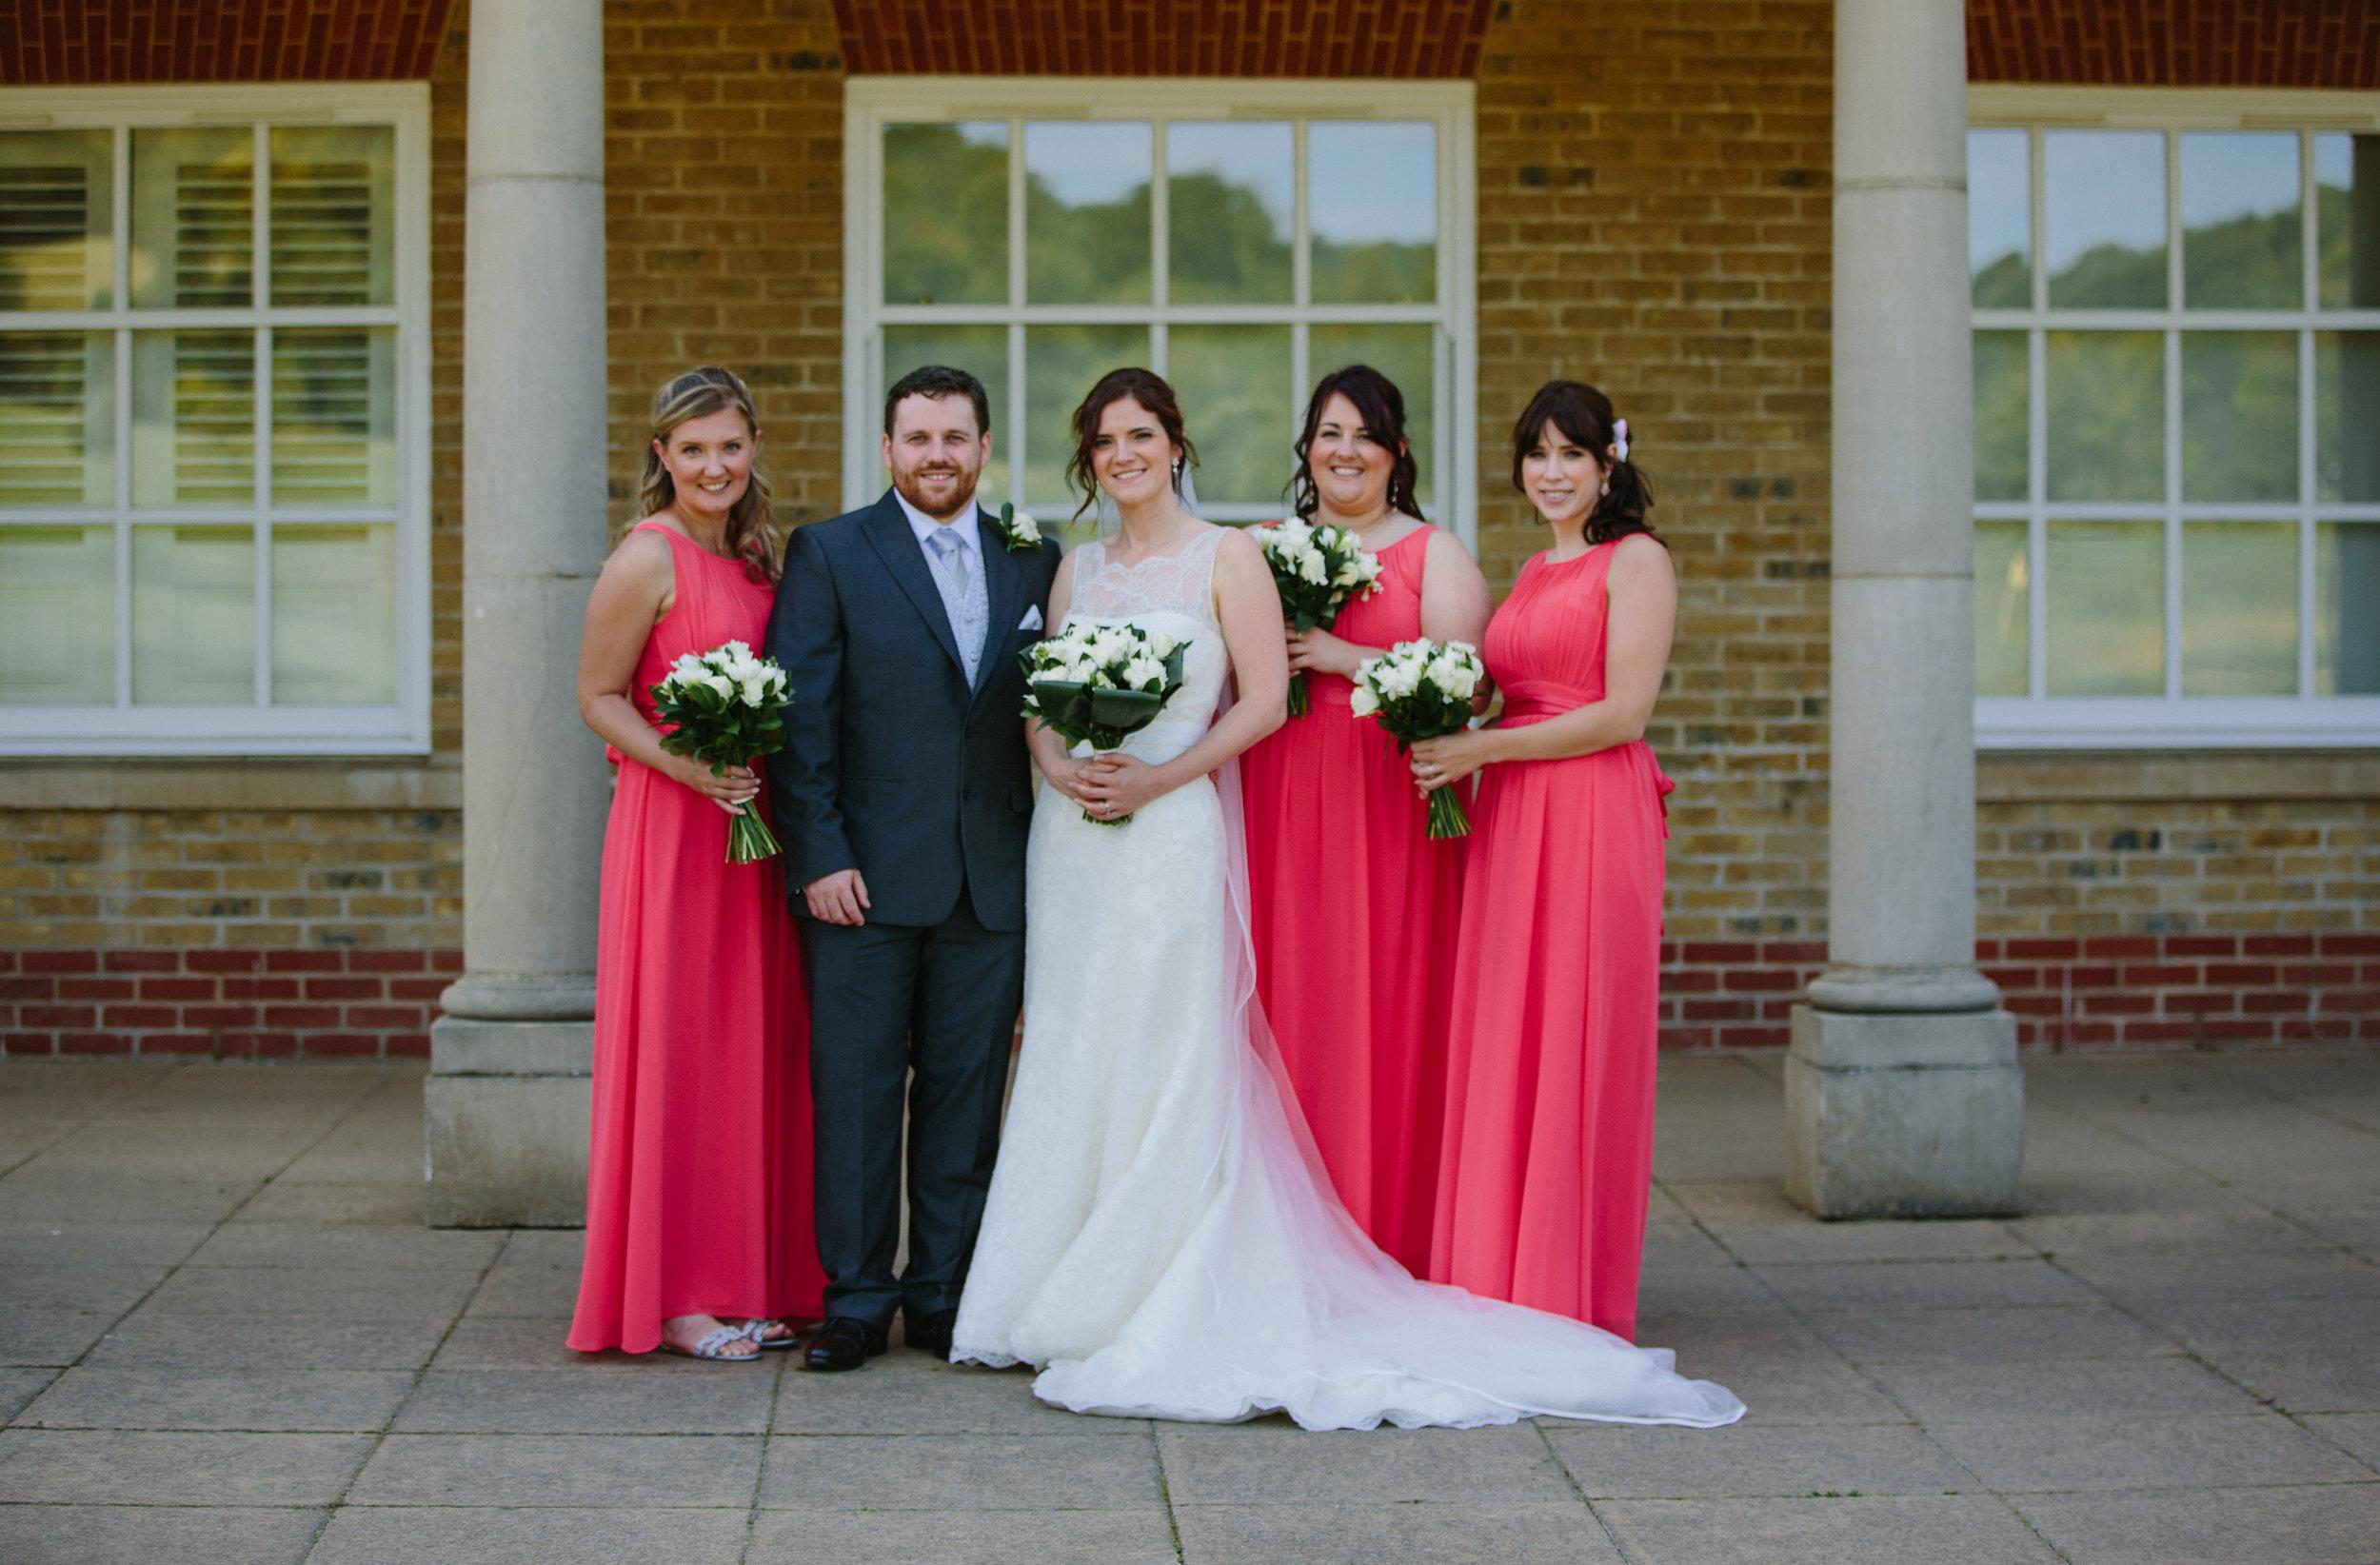 reigate-surrey-london-wedding-photography-group-formal-shot-bridesmaids-80